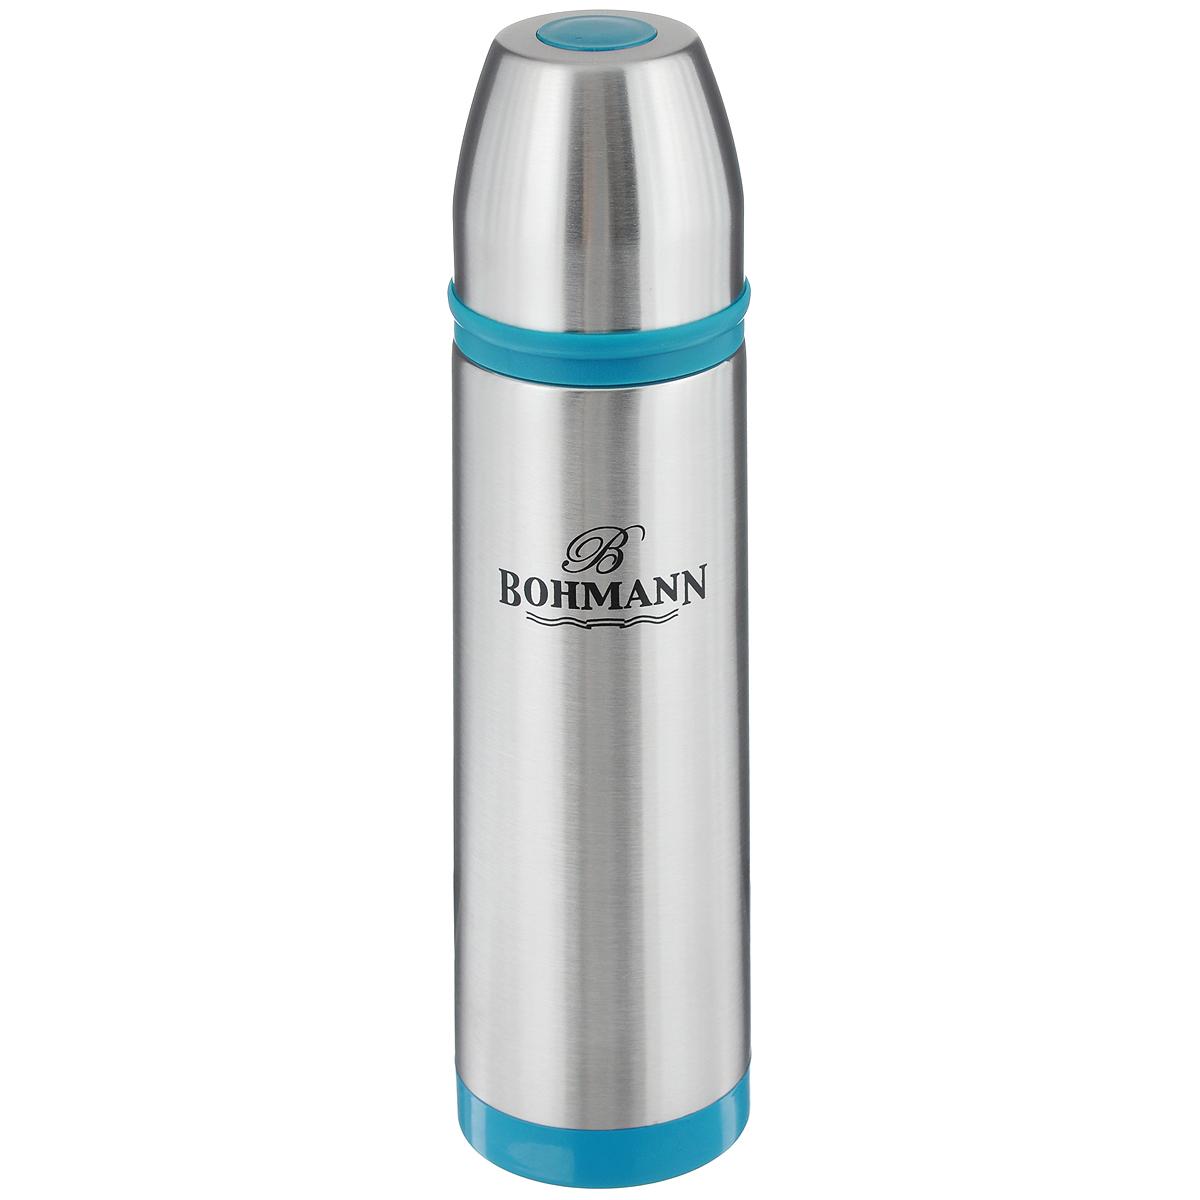 Термос Bohmann с узким горлом, цвет: металлик, голубой, 800 мл. 4491BHNEW